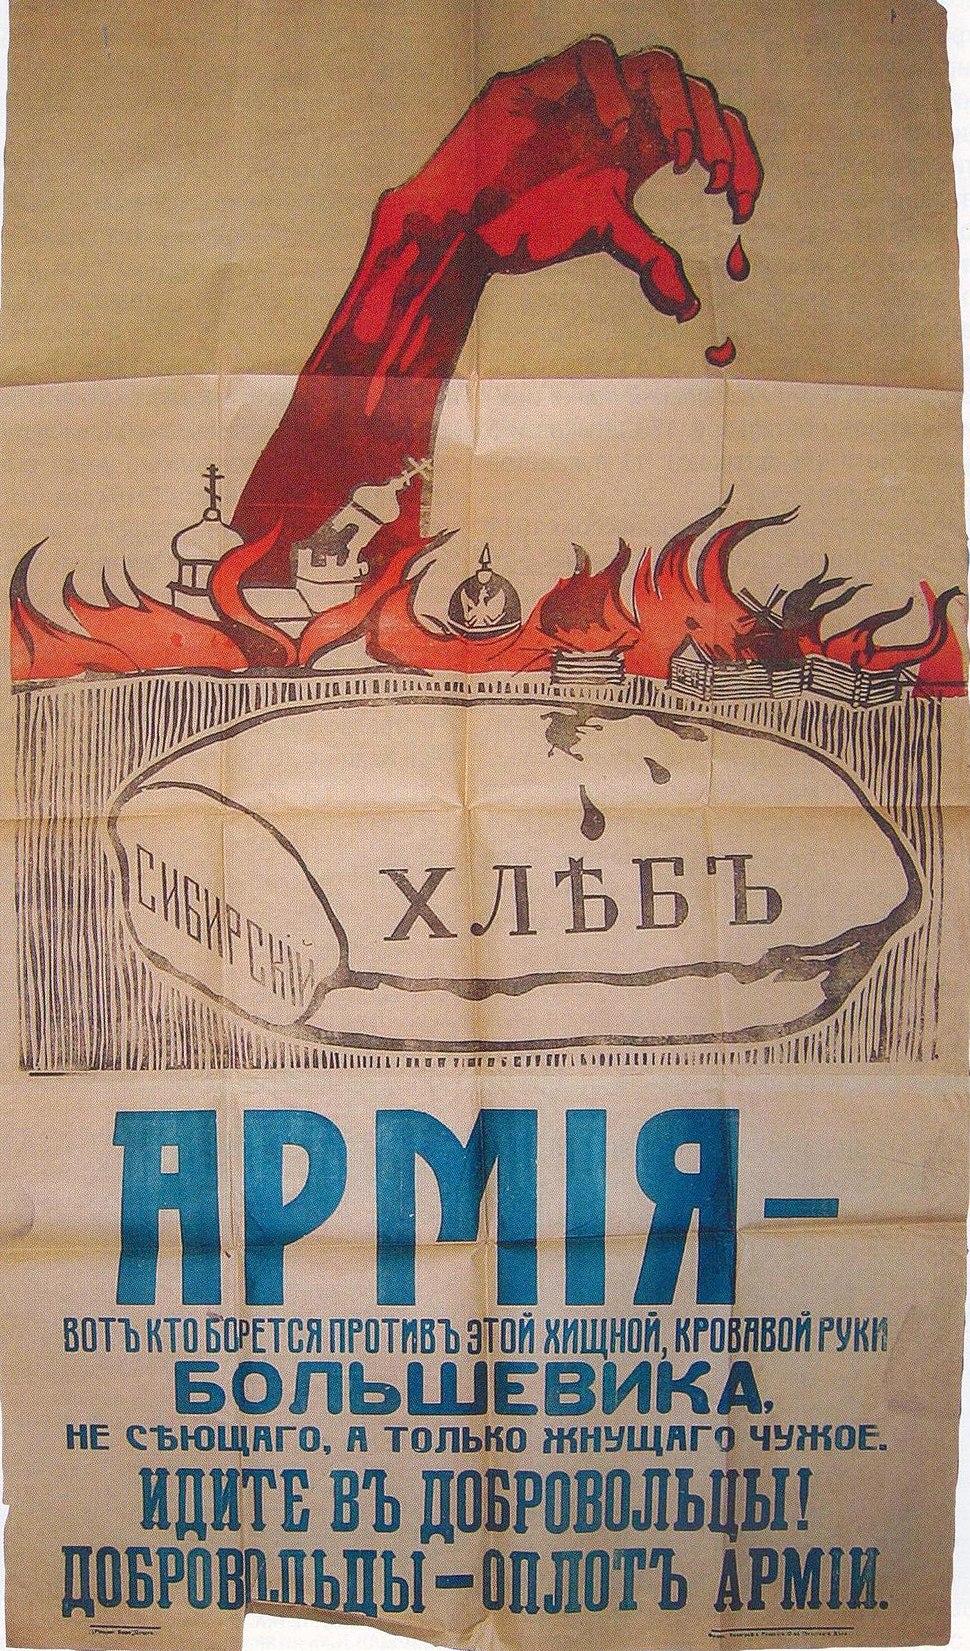 Агитационный плакат армии Колчака